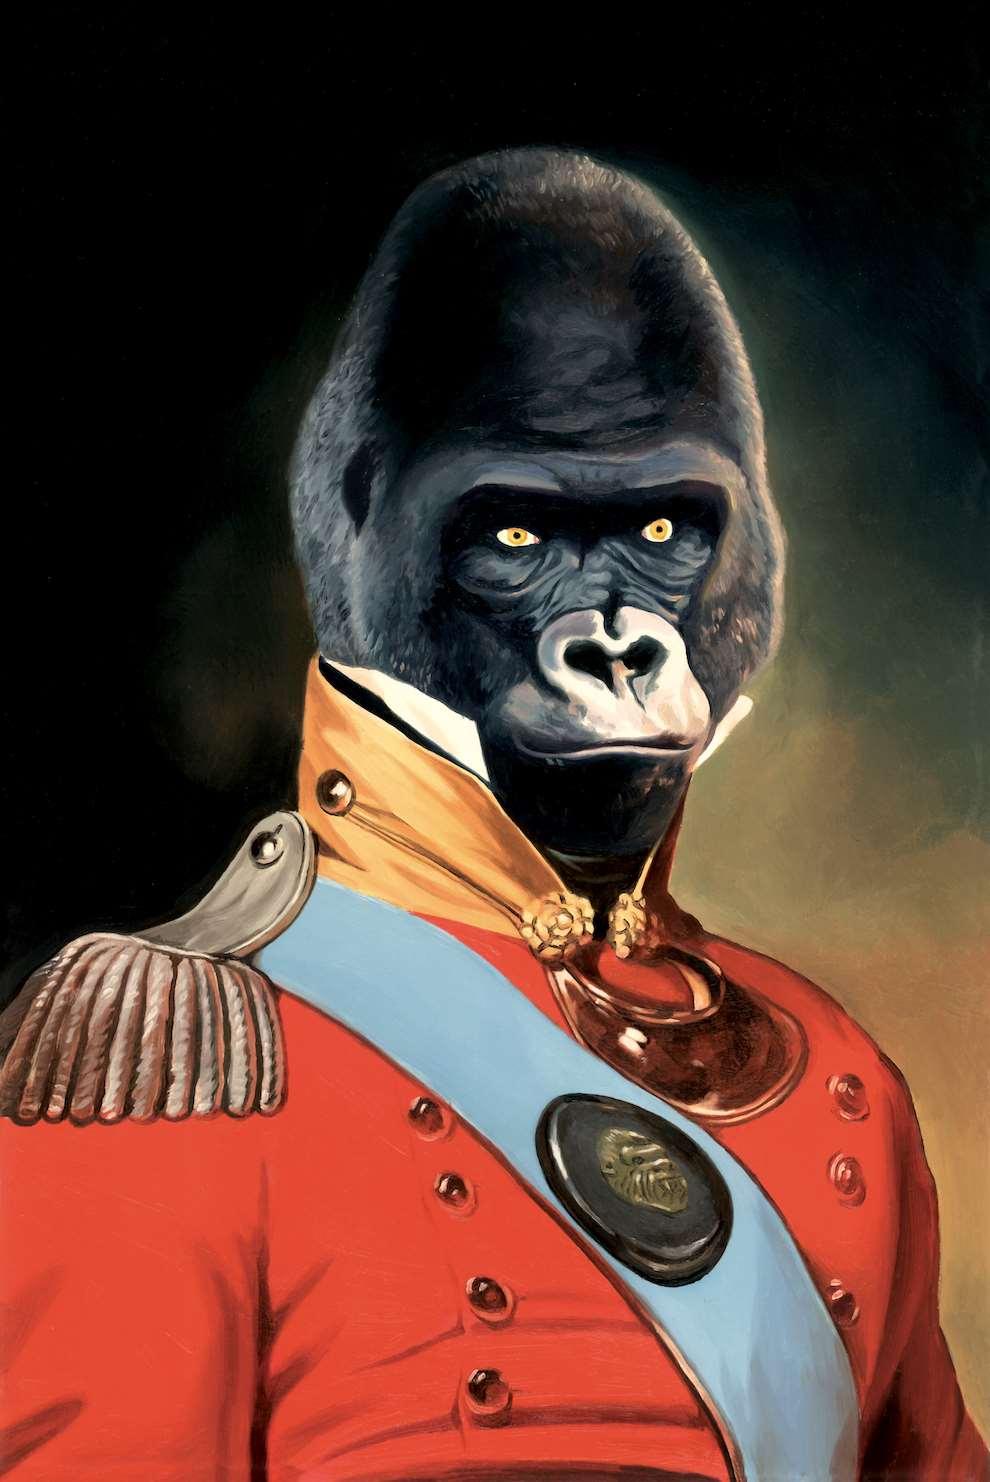 David De Las Heras, Realistic painterly portrait of an Ape wearing a solider uniform